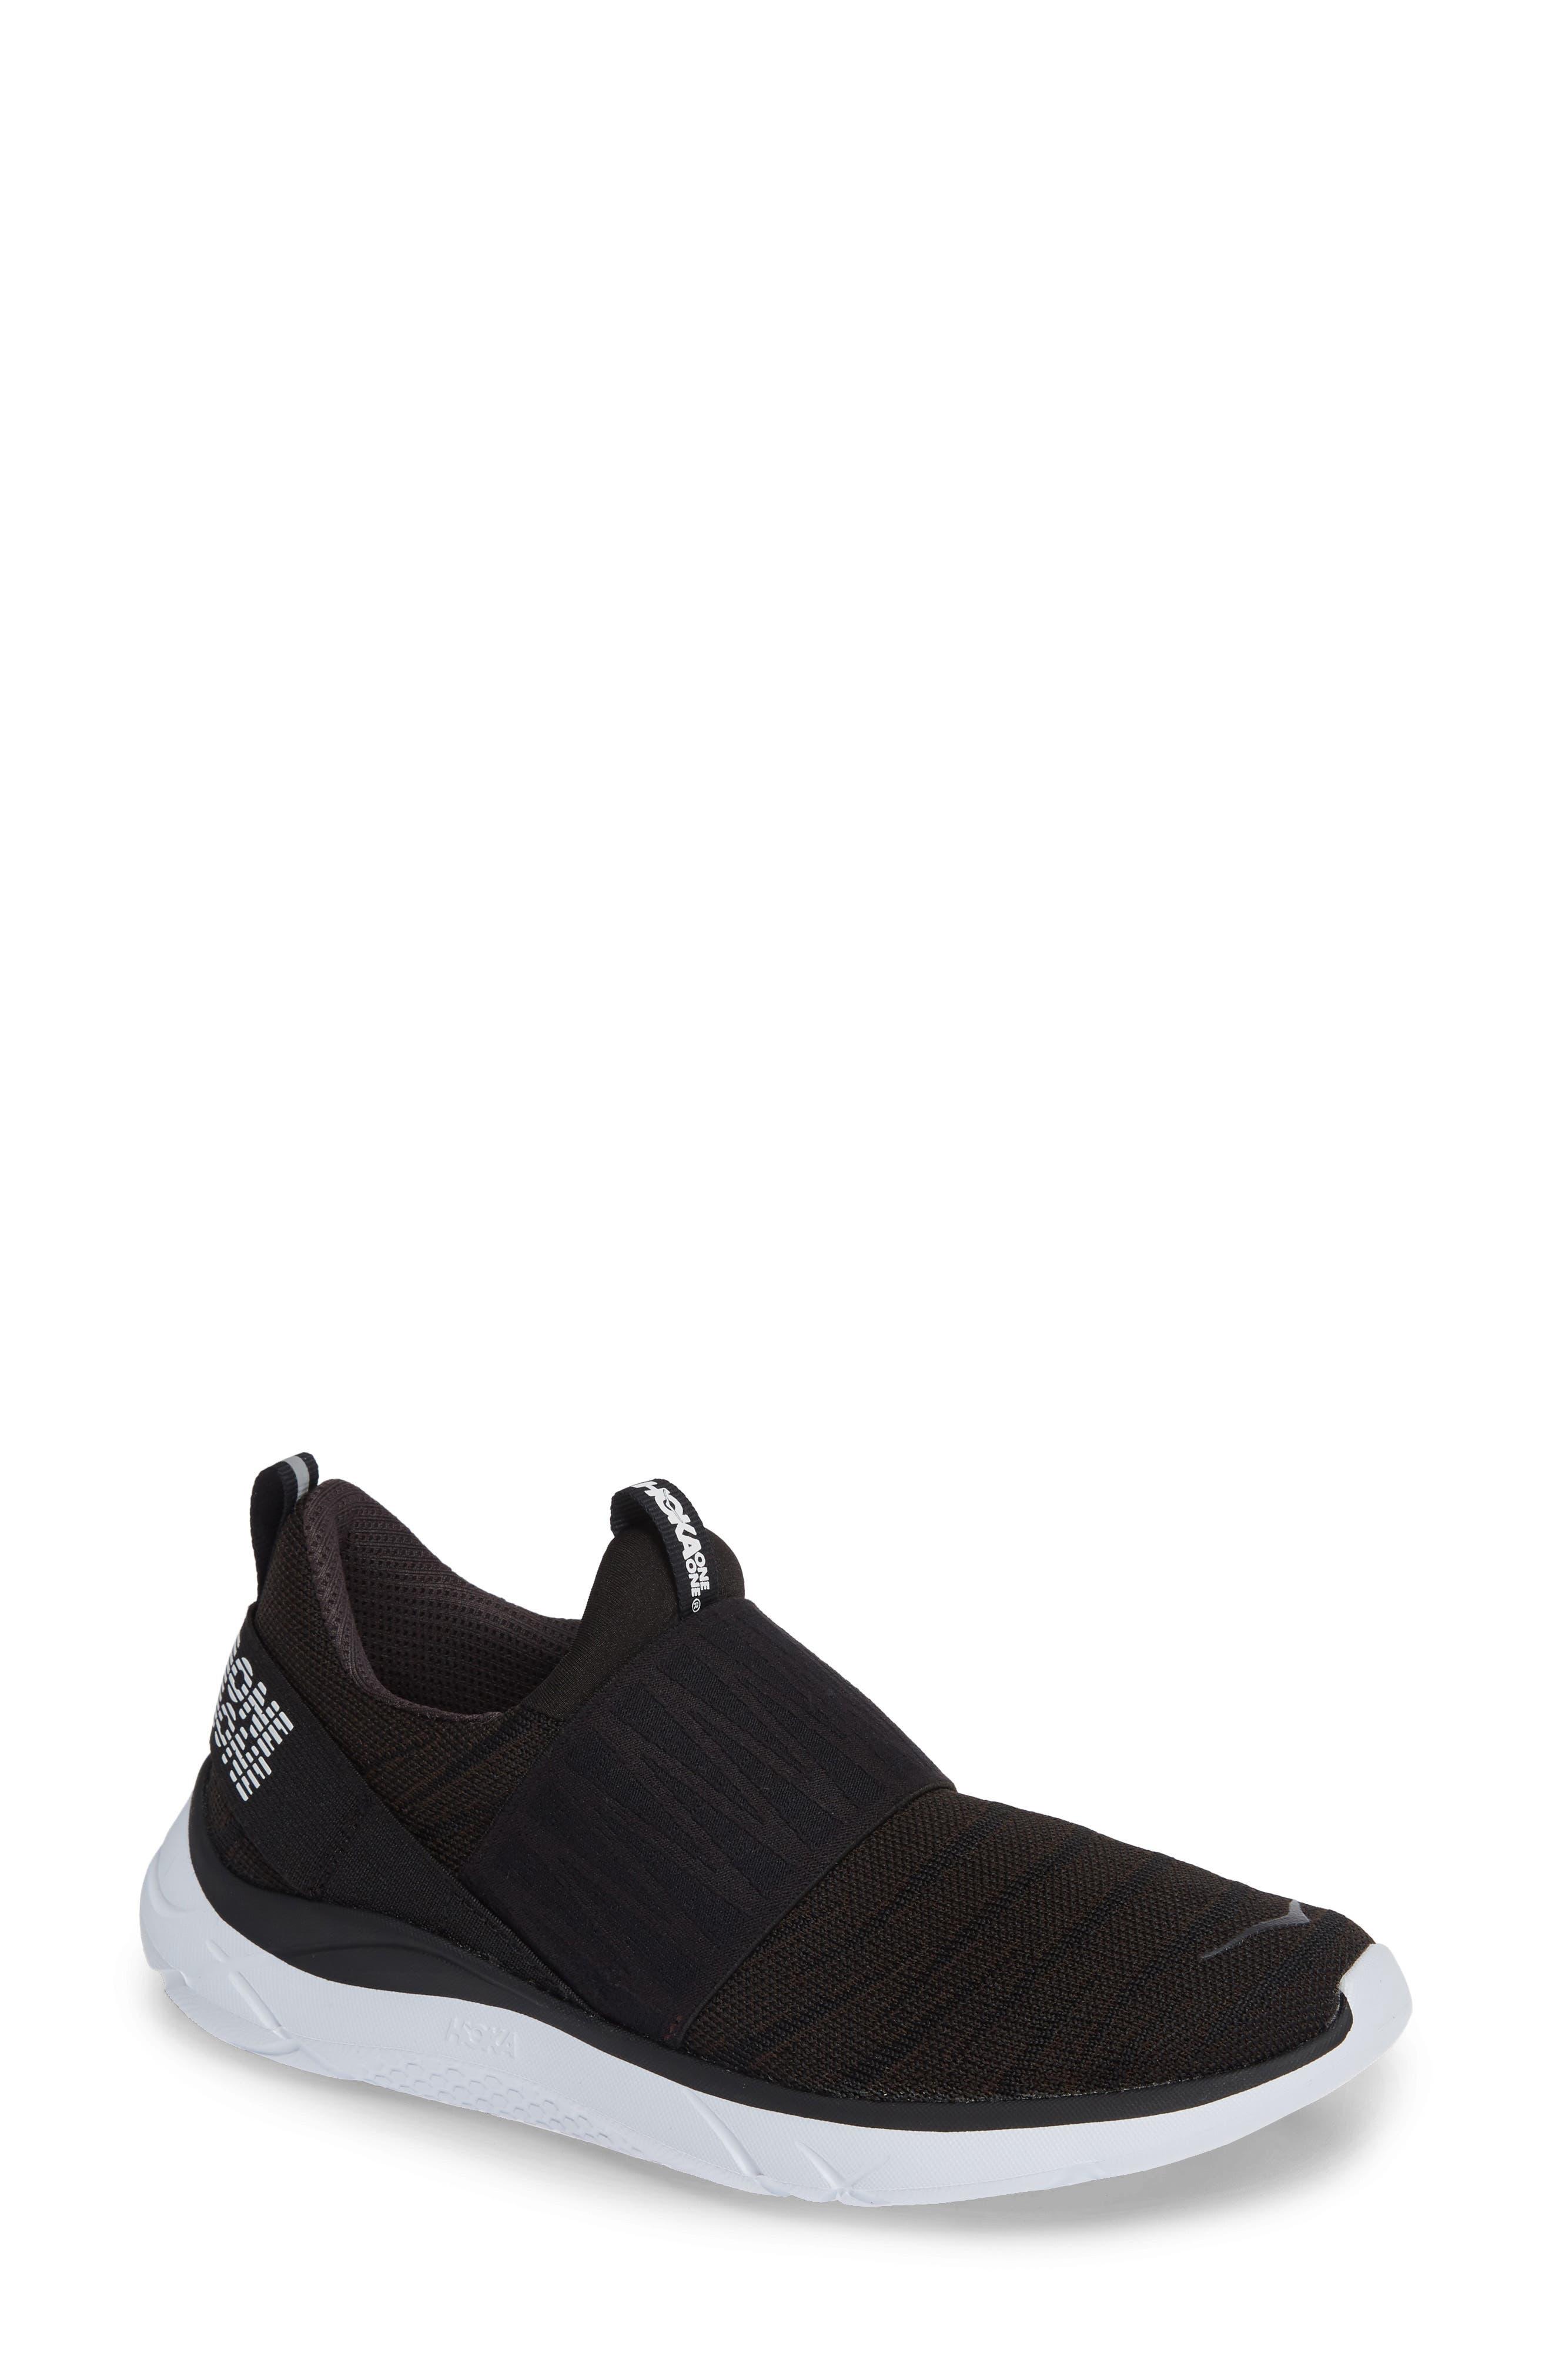 Hoka One One Hupana Knit Jacquard Slip-On Running Shoe